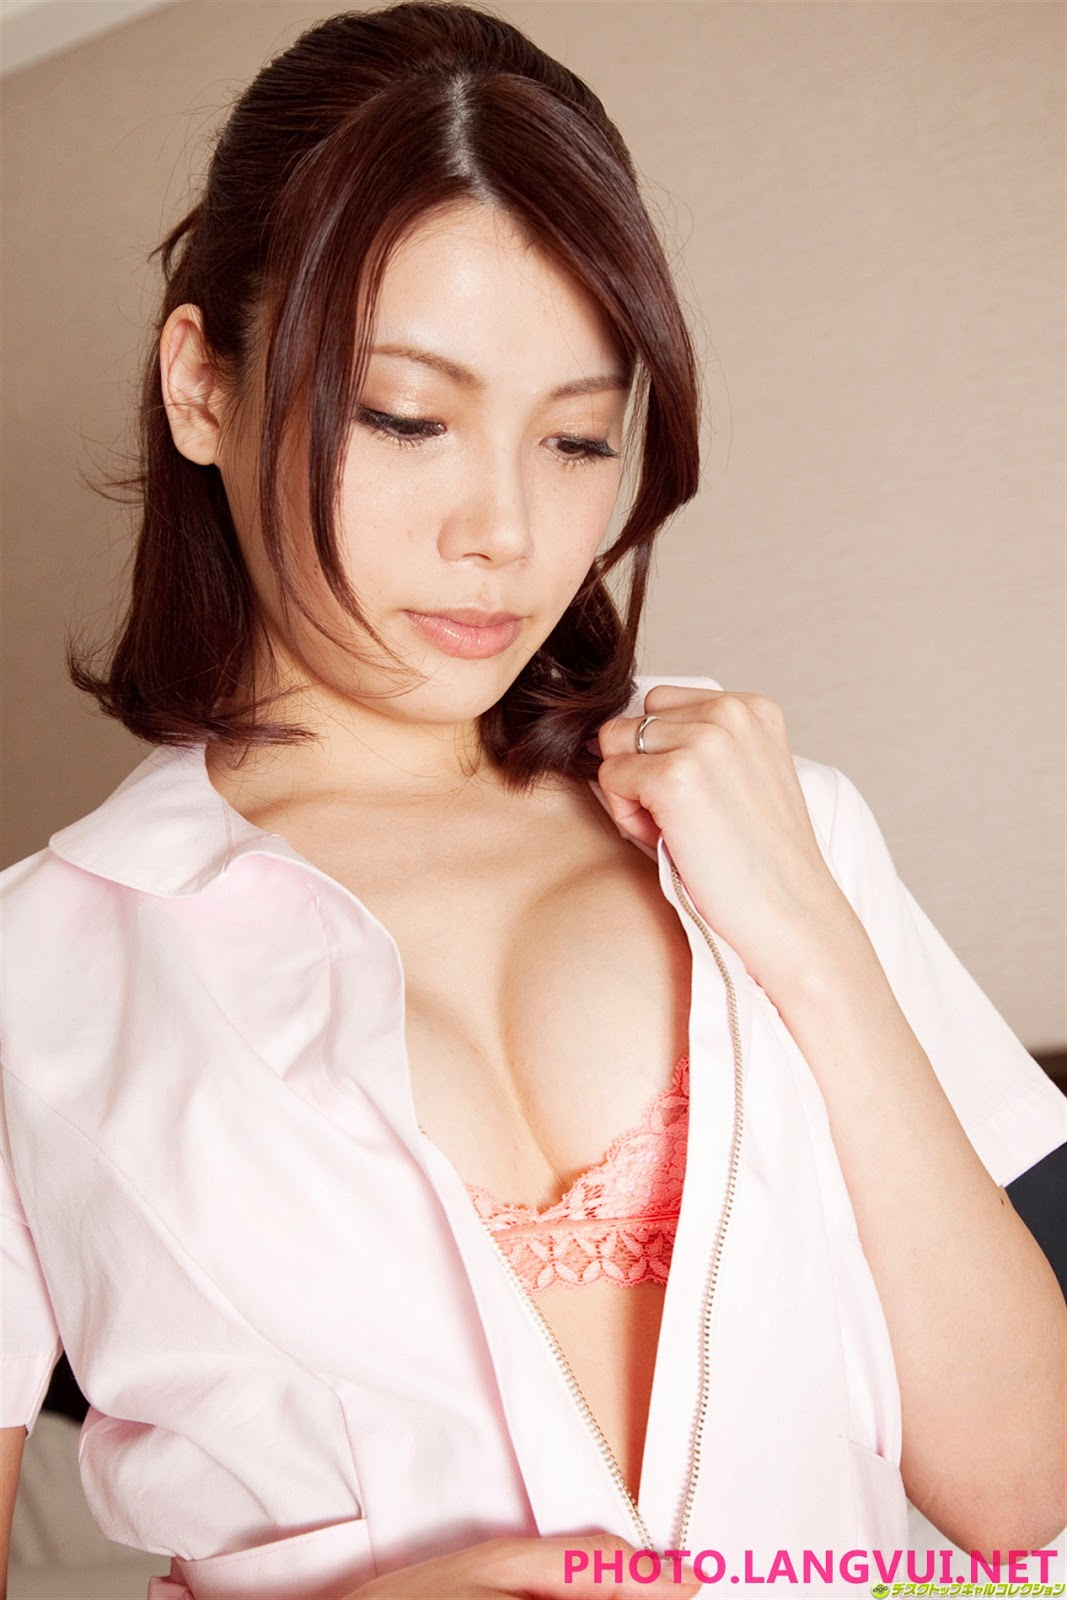 [DGC] No.1106 ~ Akemi Horiuchi - Permanent Bachelor